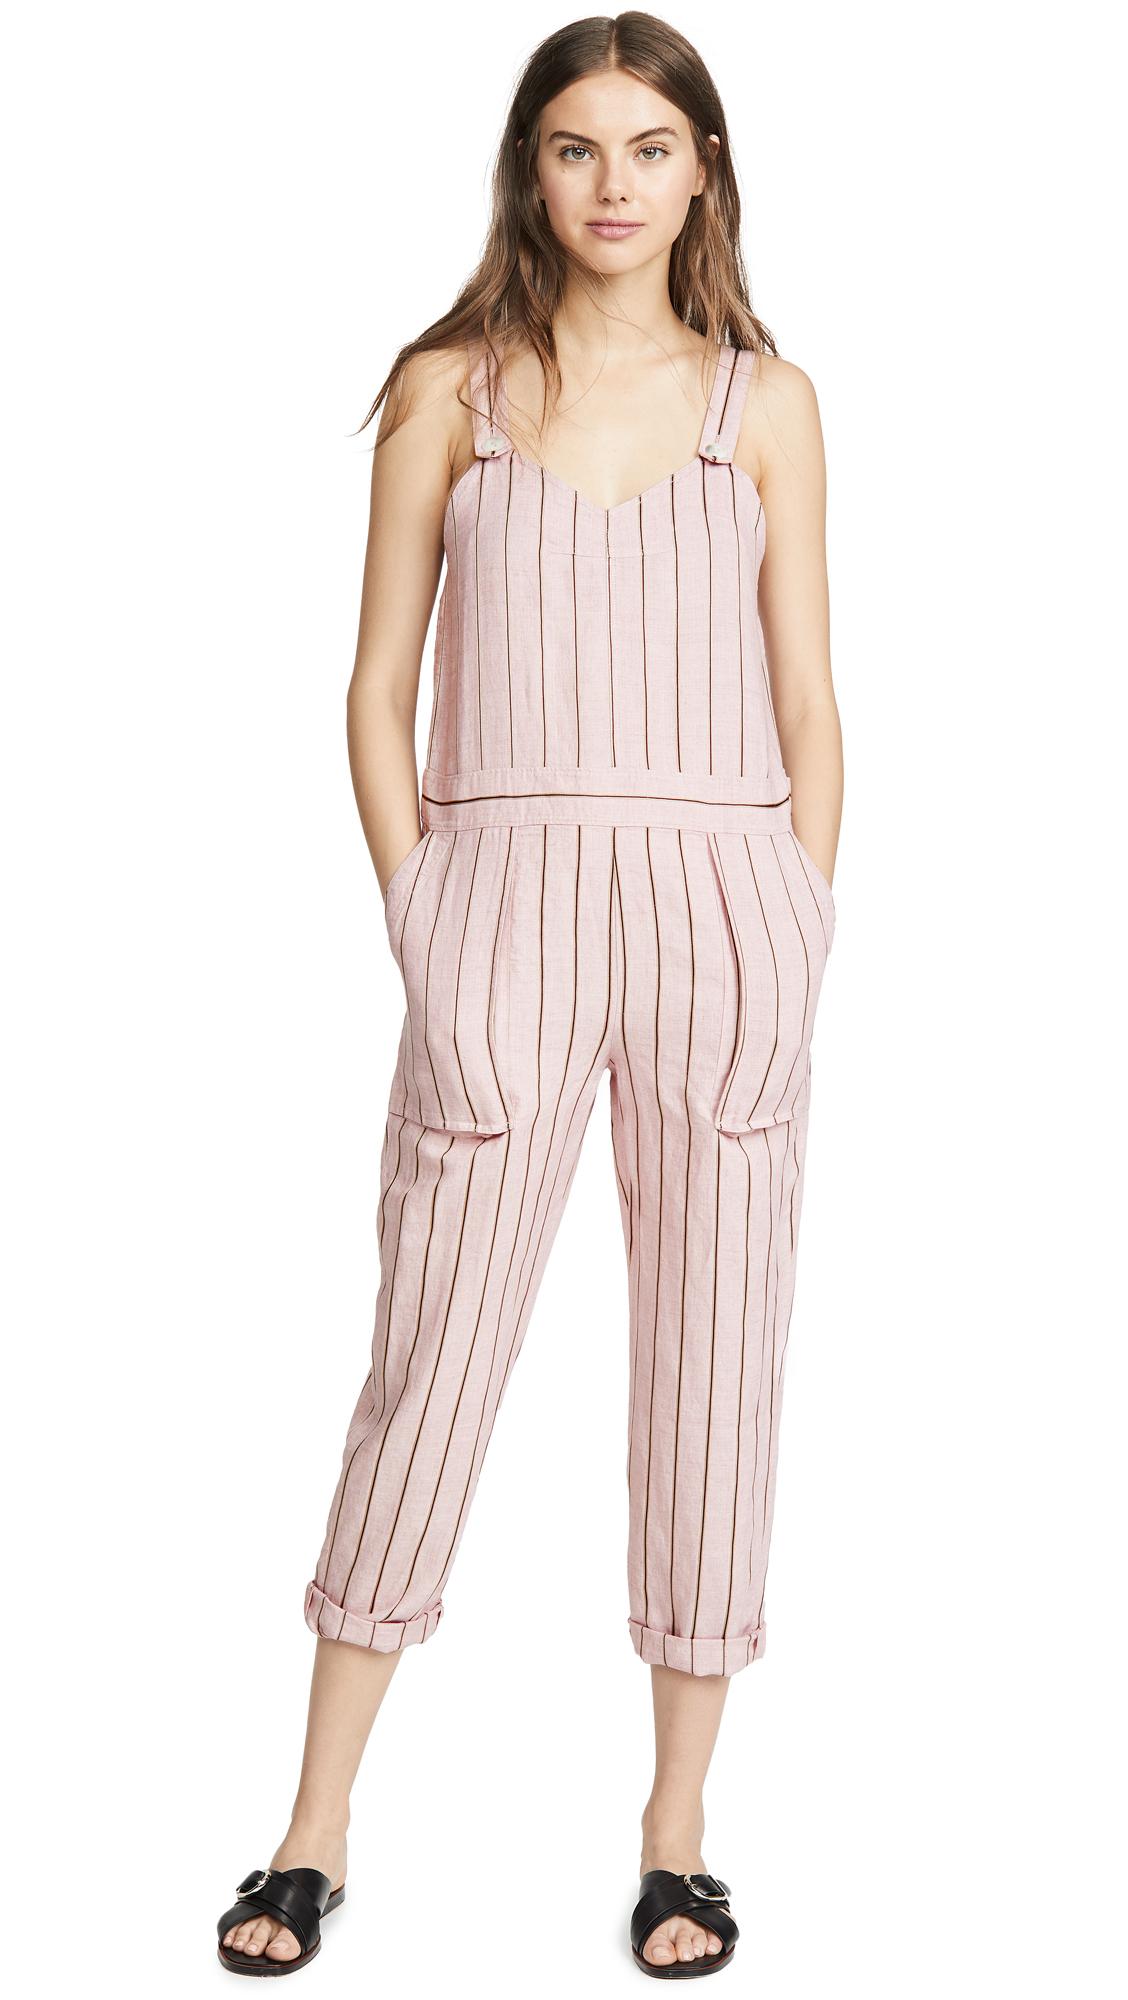 Rag & Bone Nina Striped Linen-Blend Jumpsuit In Pink Multi